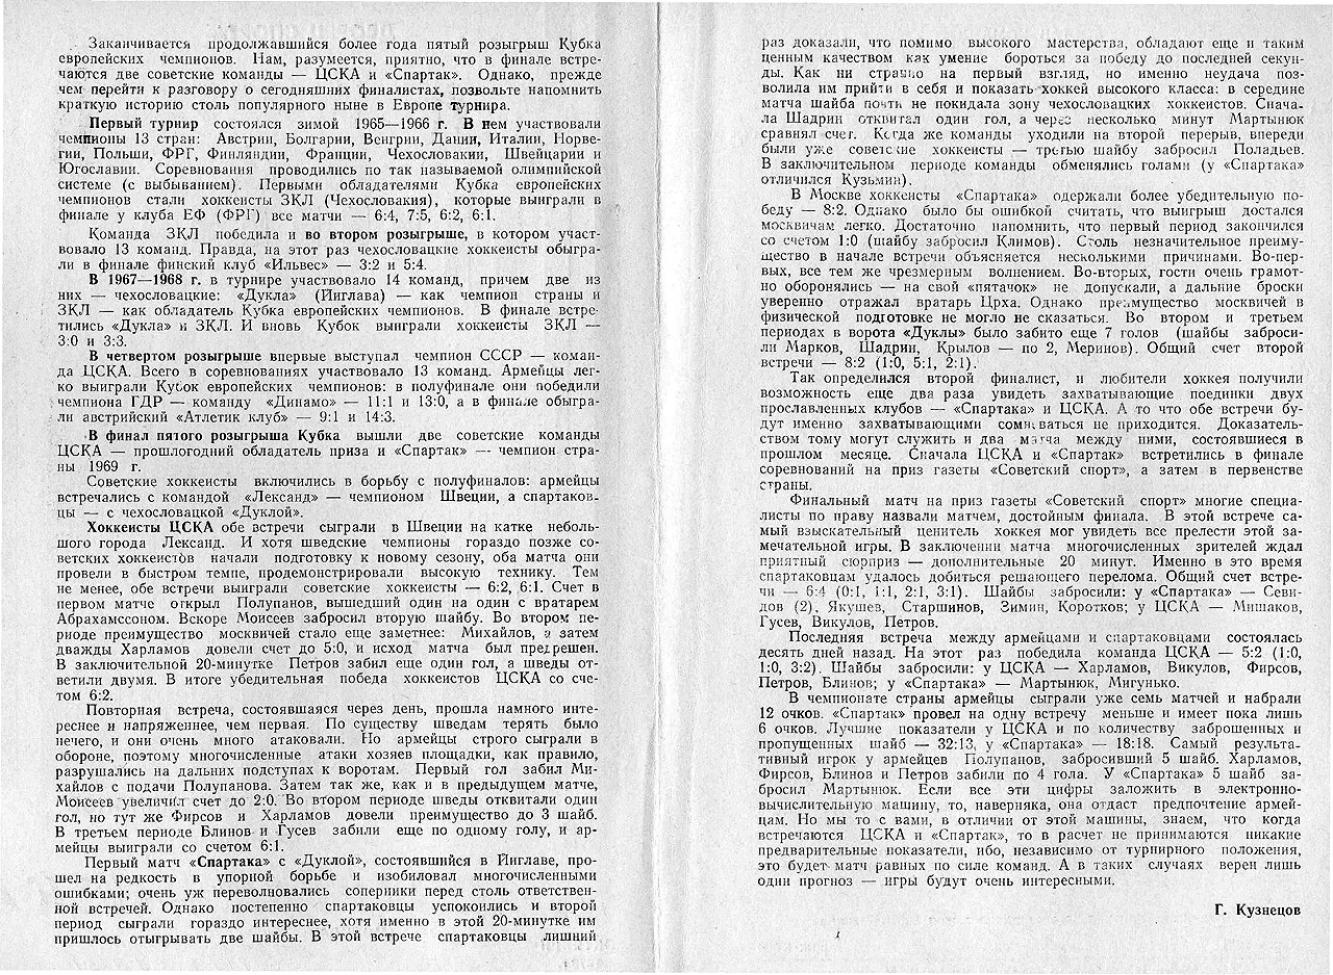 1970.10.08-10. Спартак - ЦСКА (Кб. ЕЧ, Финал)_02.png